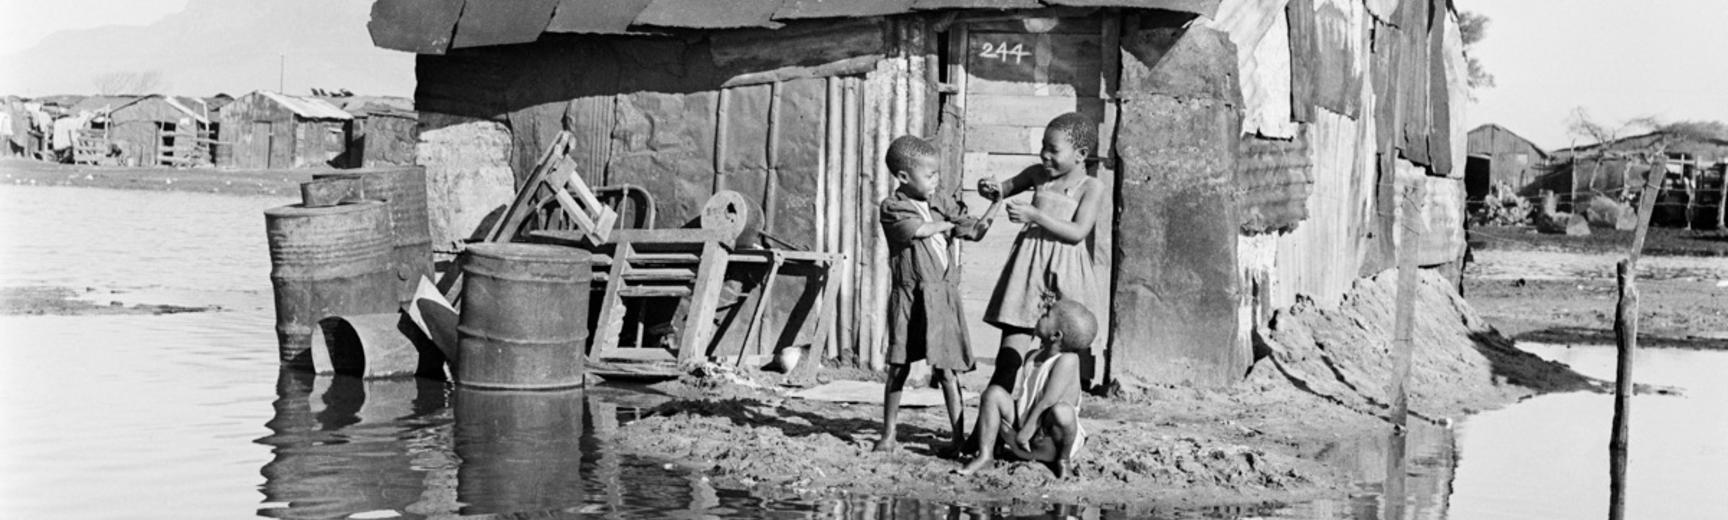 Windermere, Cape Town, South Africa. Photograph by Bryan Heseltine. Circa 1949–1952. (Copyright Bryan Heseltine)